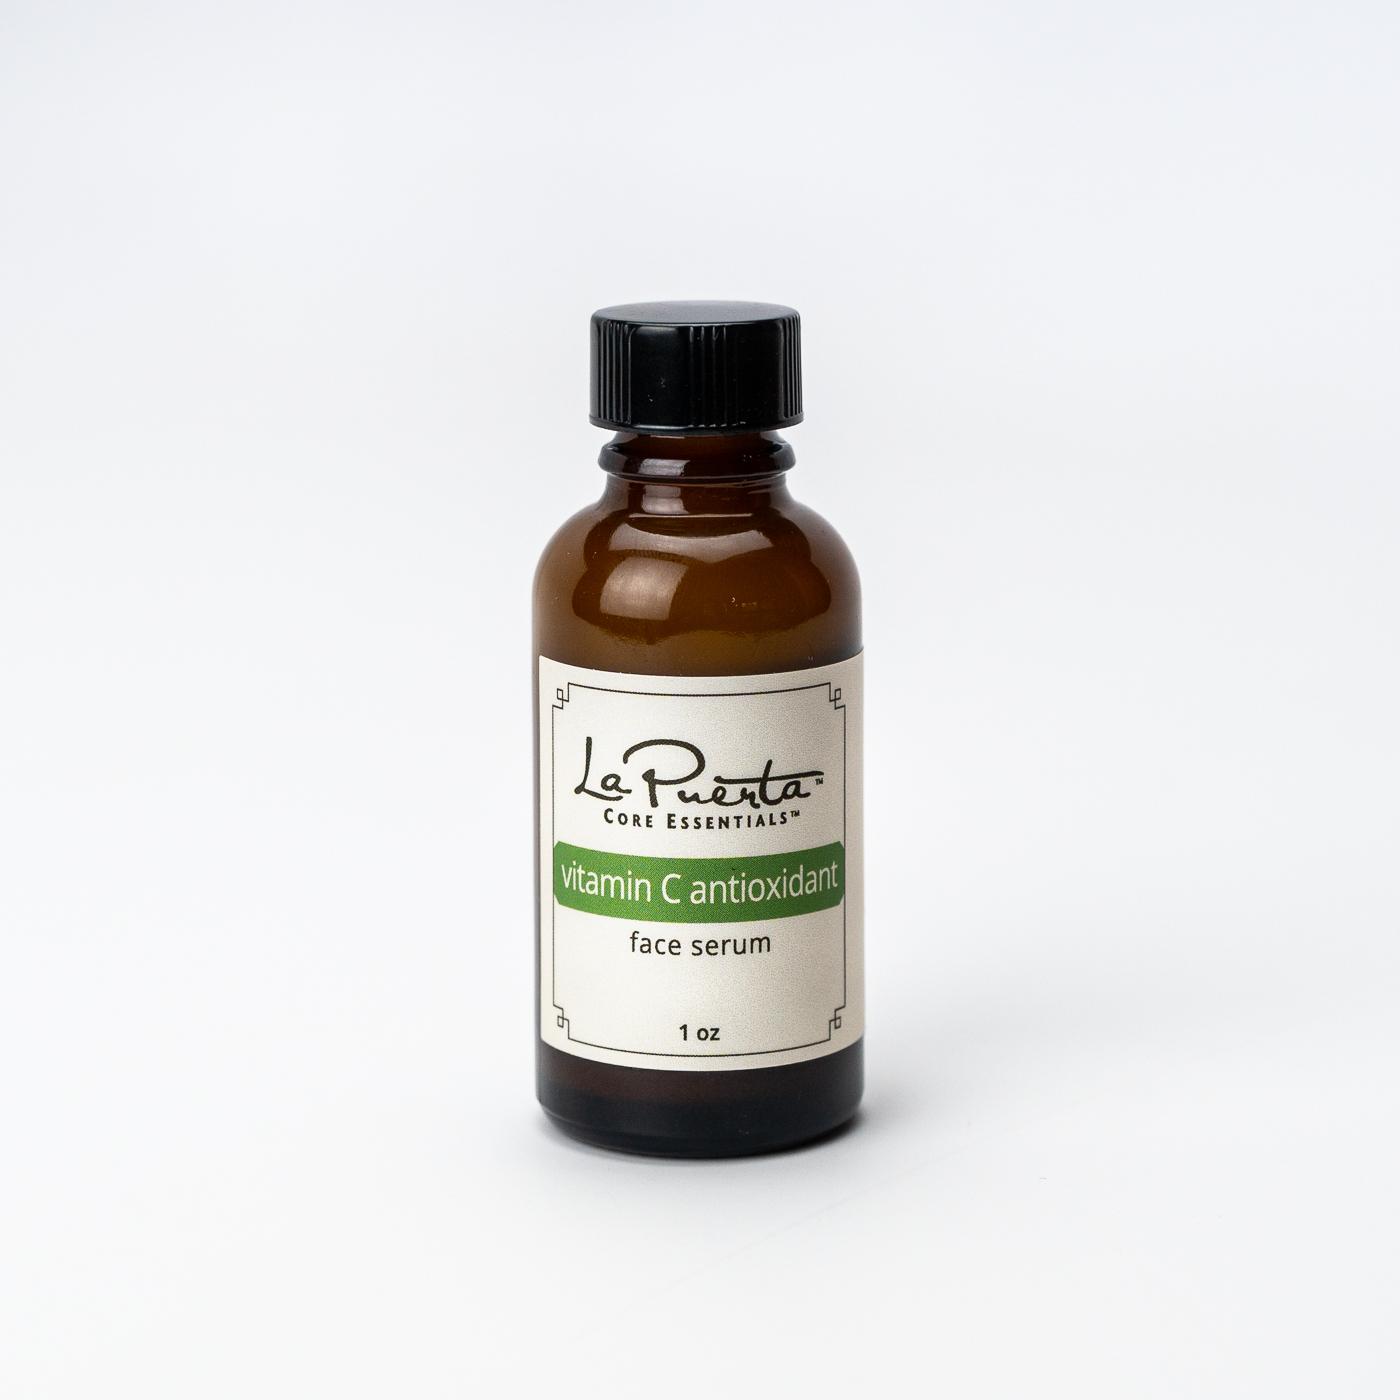 Why You Need La Puerta Core Essentials ™ Vitamin C Antioxidant Face Serum